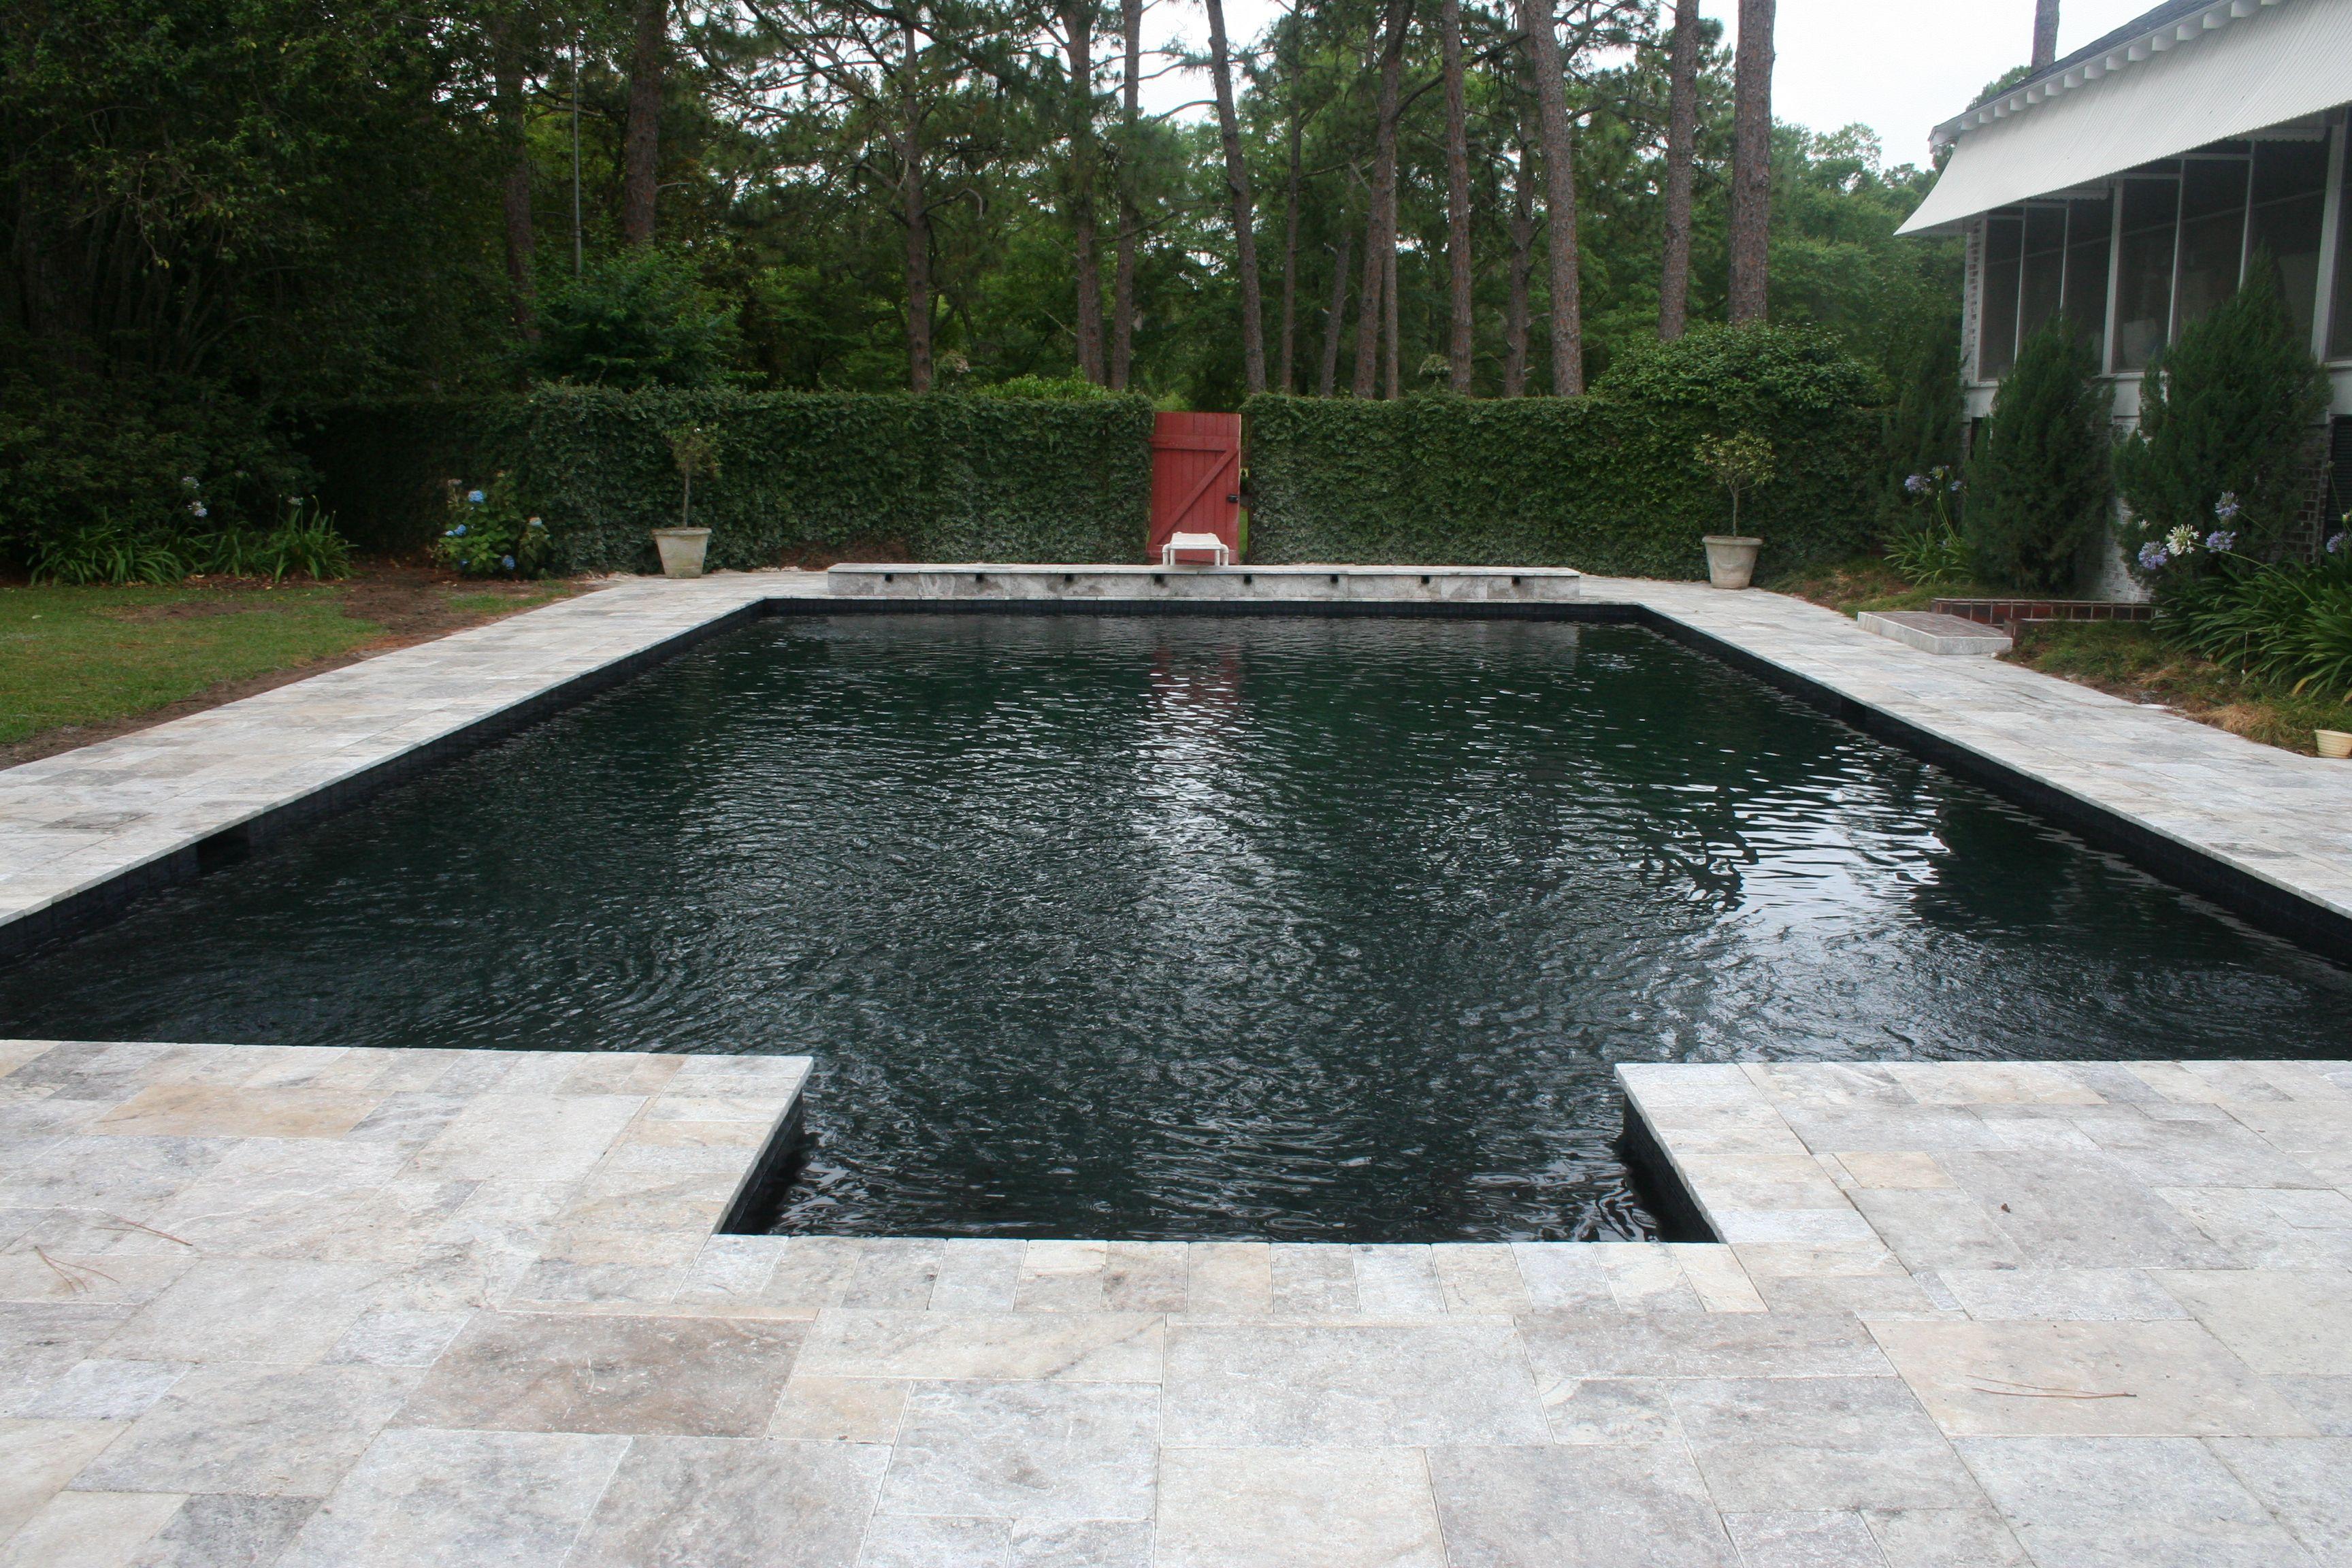 Travertine Pool Deck Colors Google Search Travertine Pool